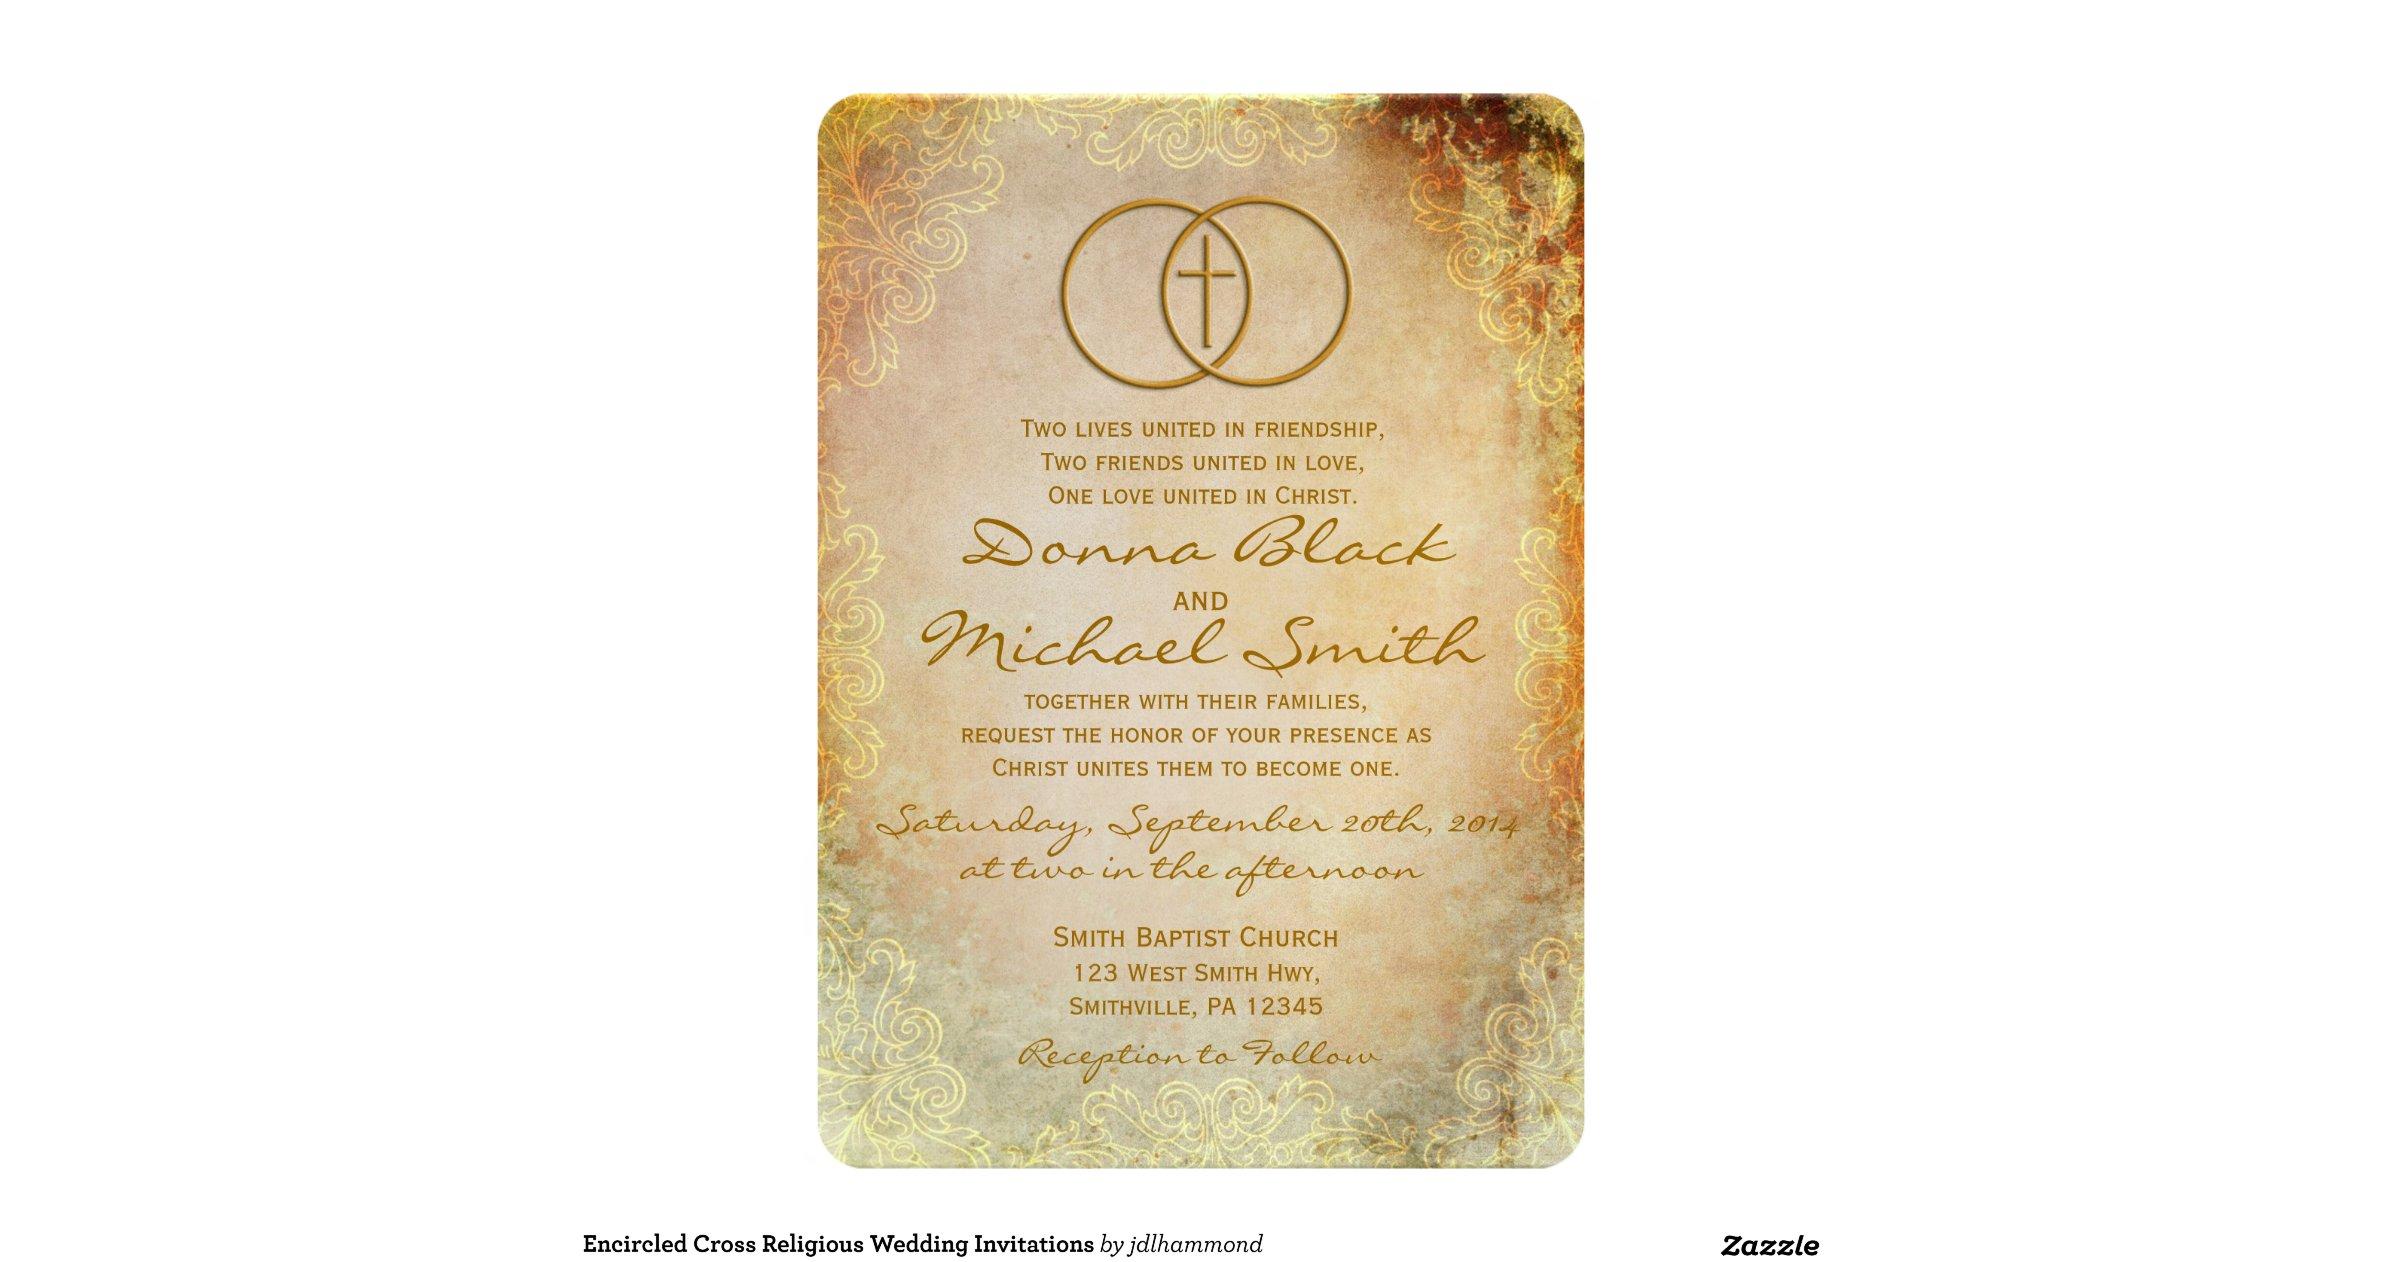 Religious Wedding Invitation Wording: Encircled_cross_religious_wedding_invitations